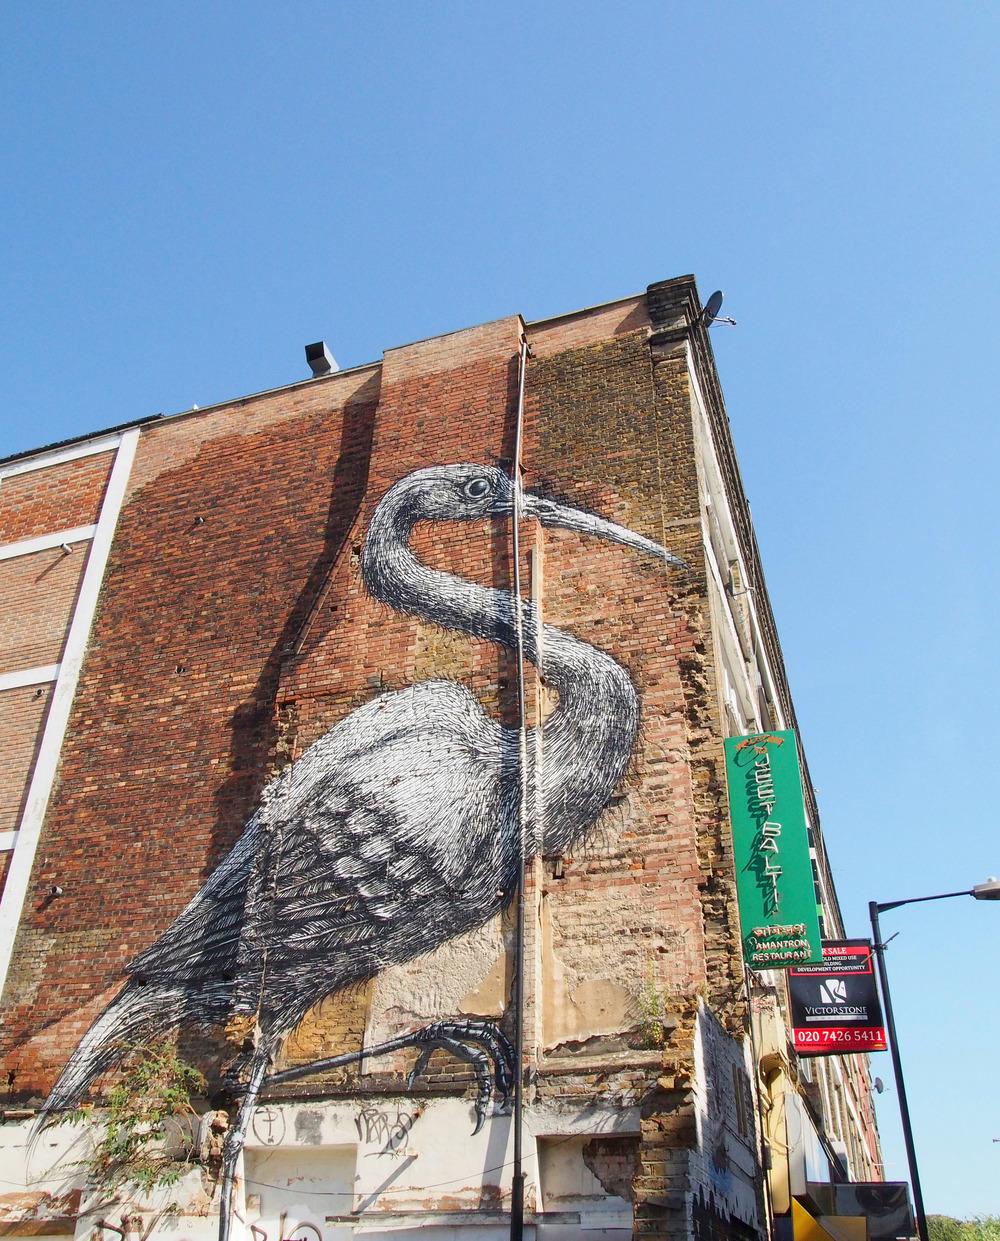 Bricklane, London  Work by Roa